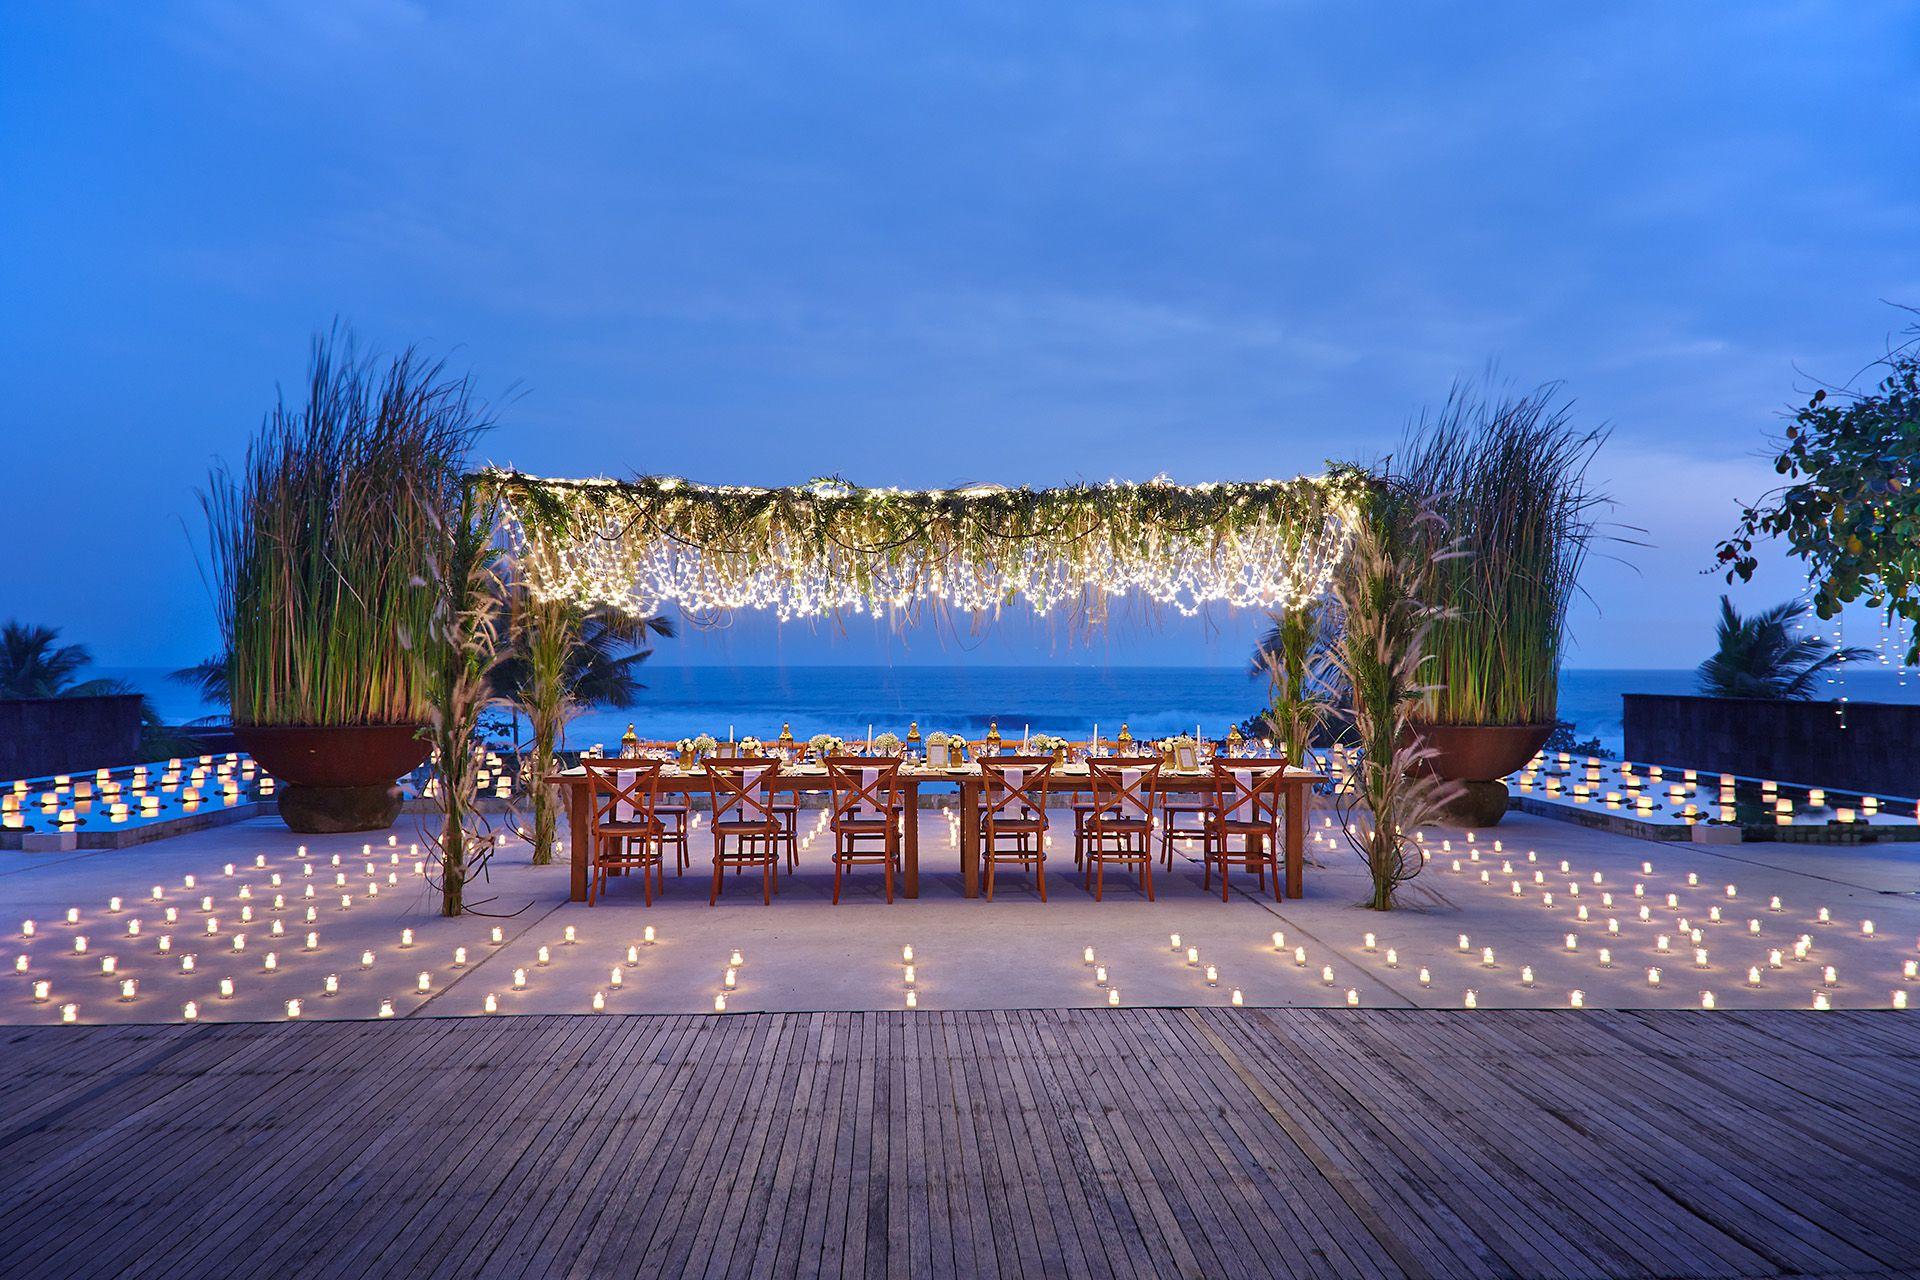 Bali wedding venues on the beach  Pin by Ben Foster on SLY BEN  Wedding ideas  Pinterest  Romantic